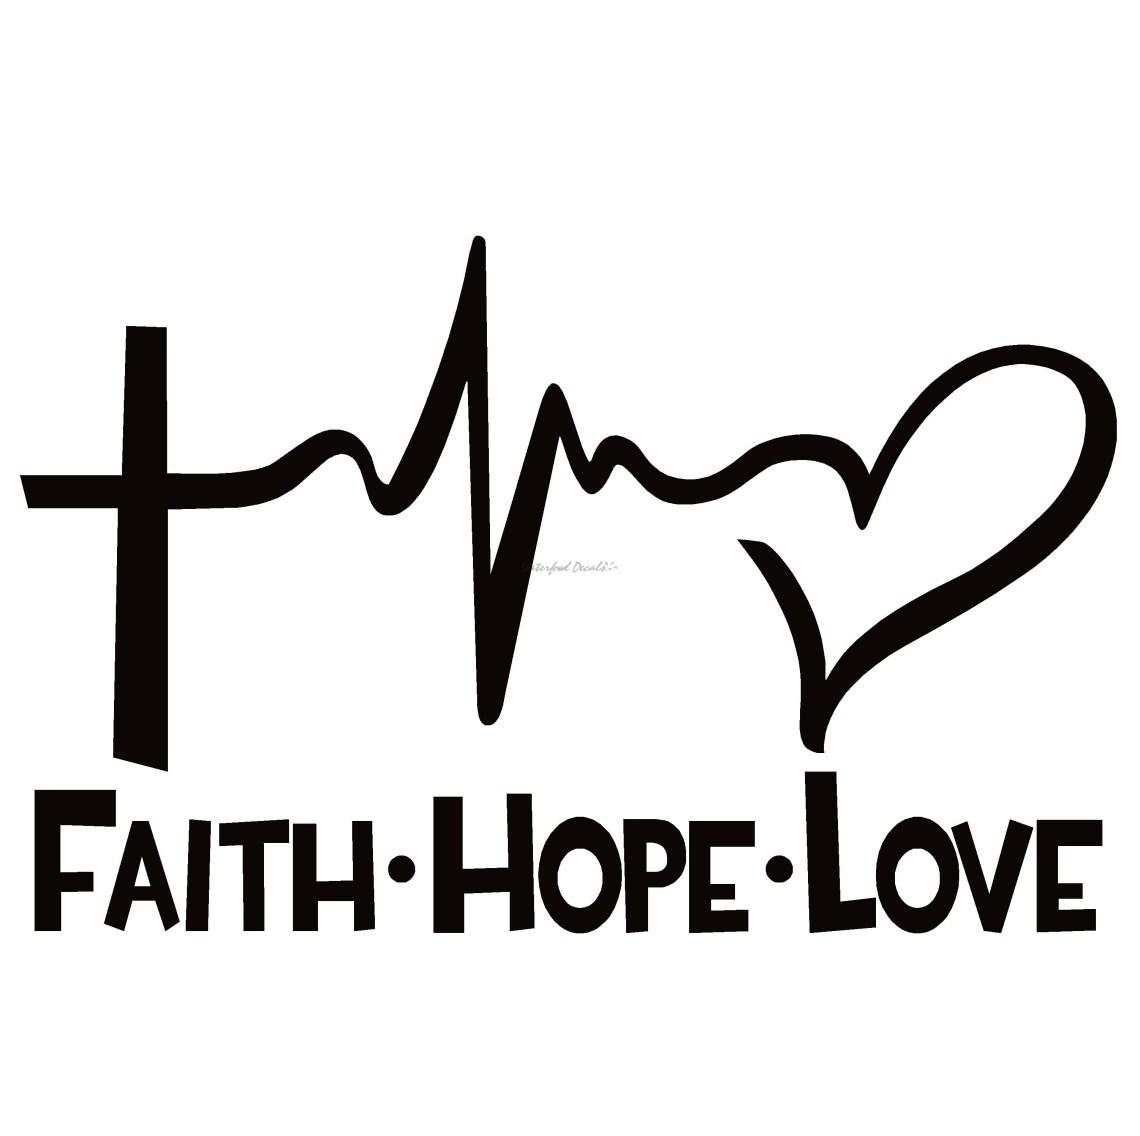 Download Faith Hope Love Window Decal - Faith Hope Love Window Sticker